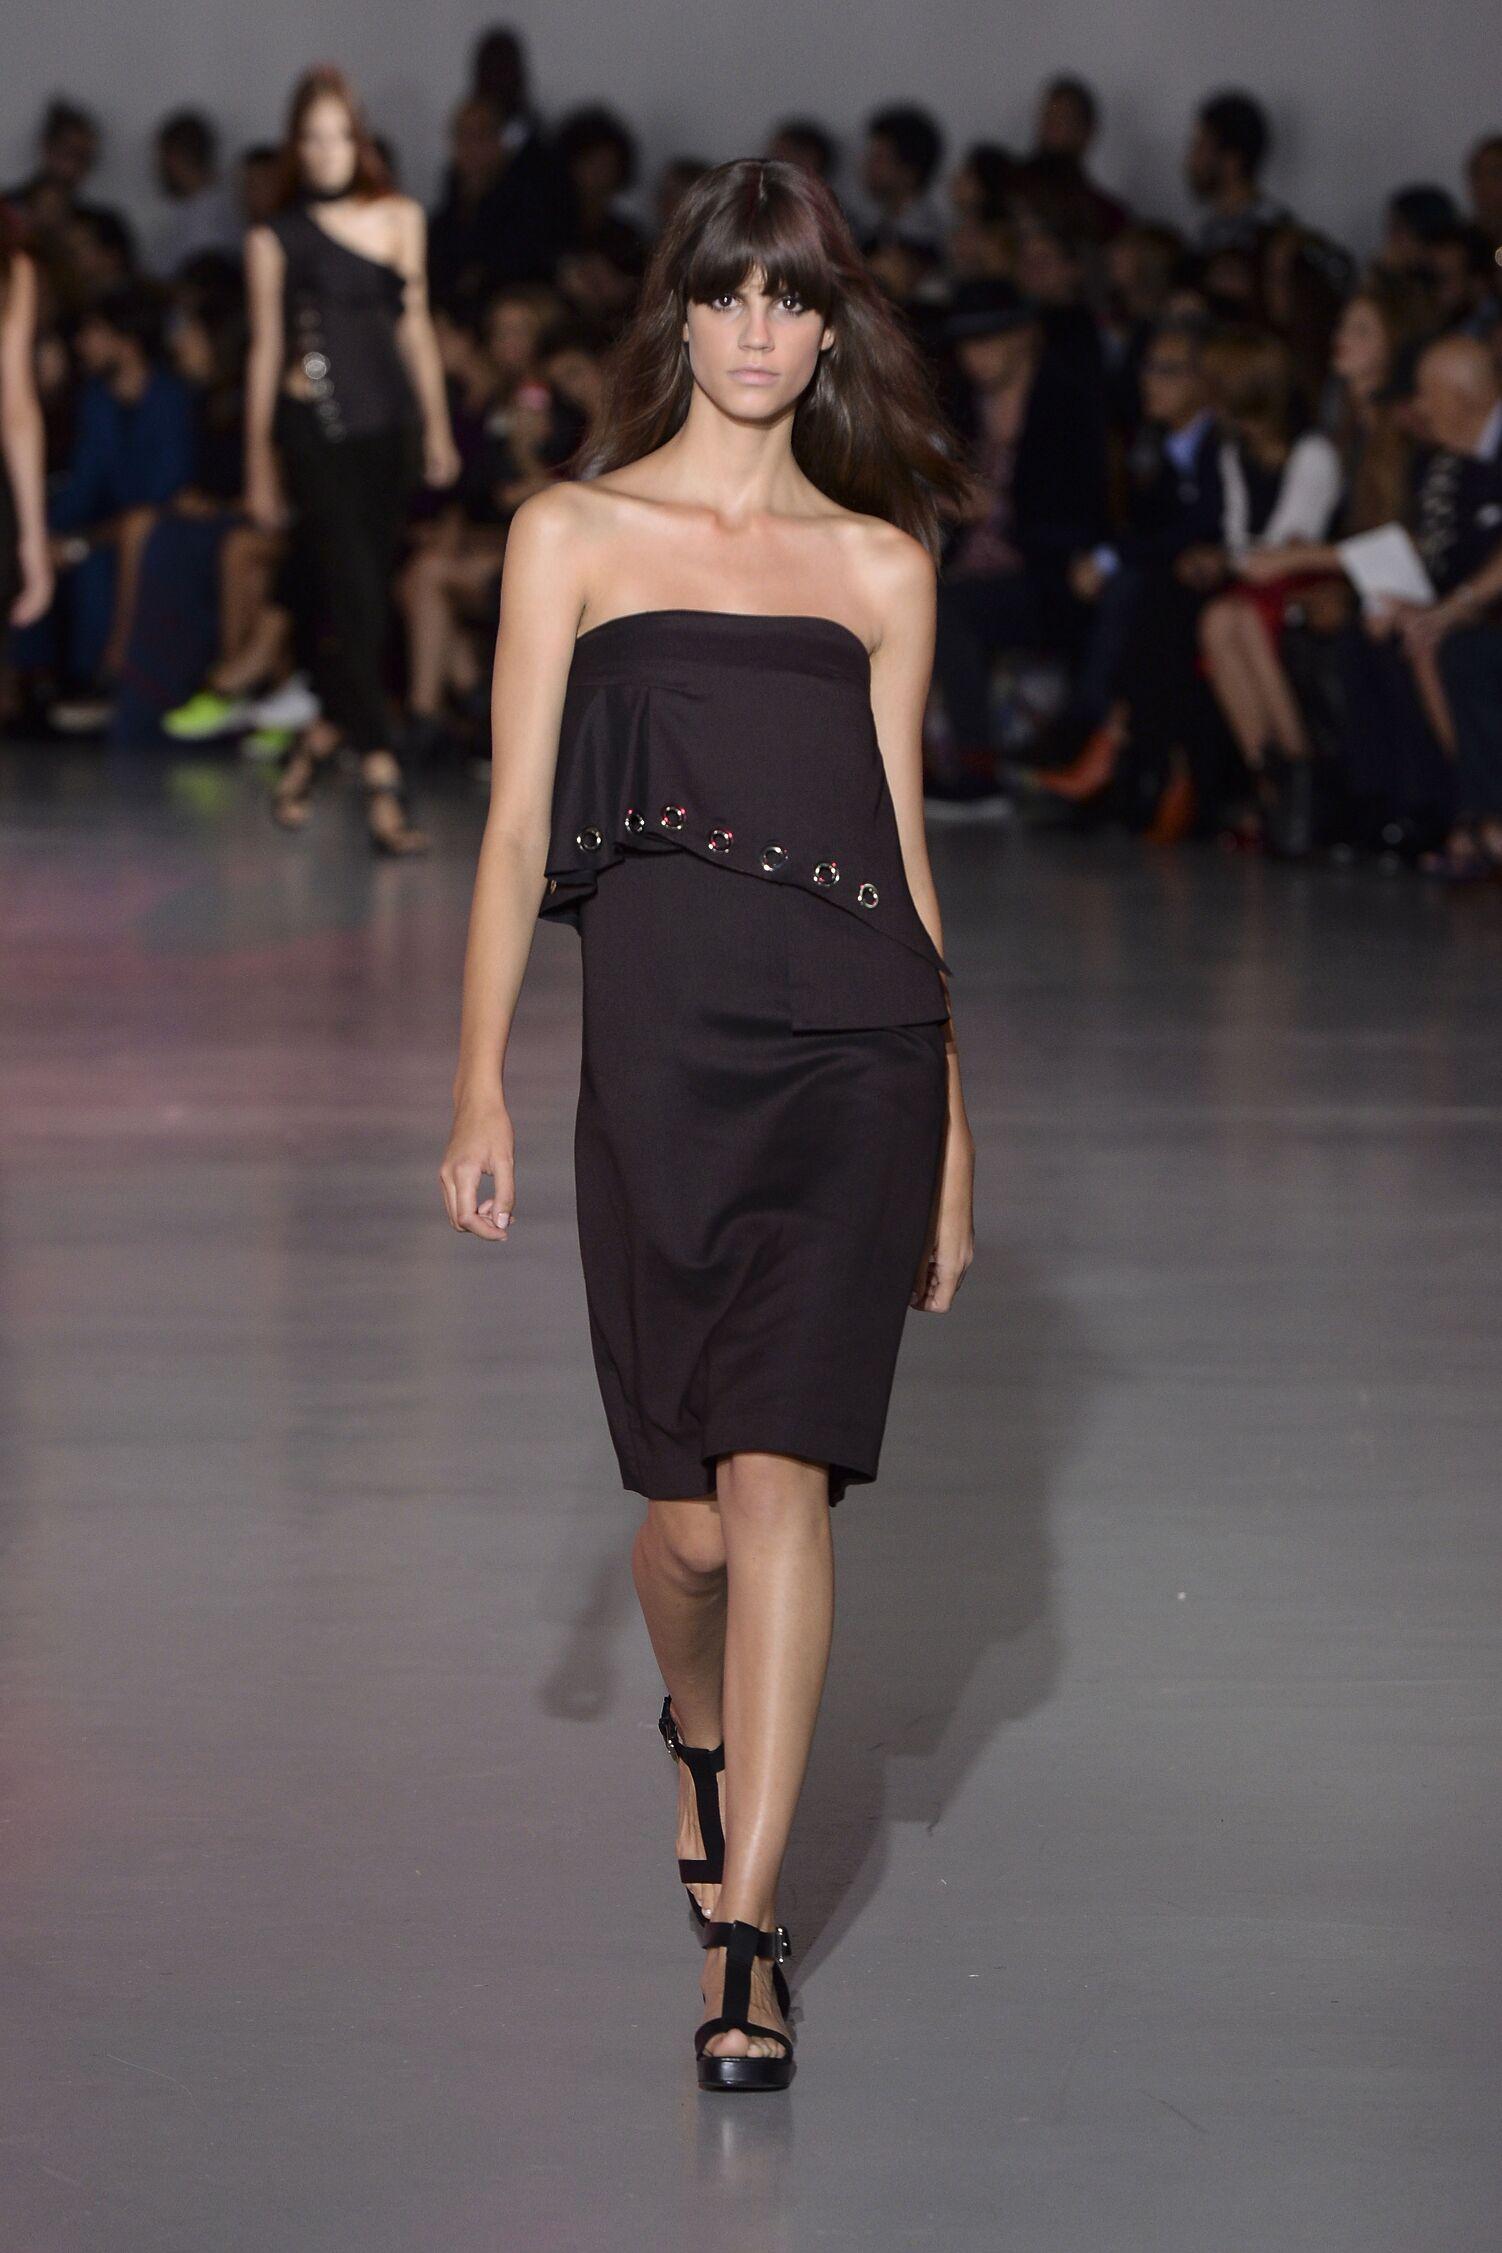 Summer 2015 Fashion Model Costume National Womenswear